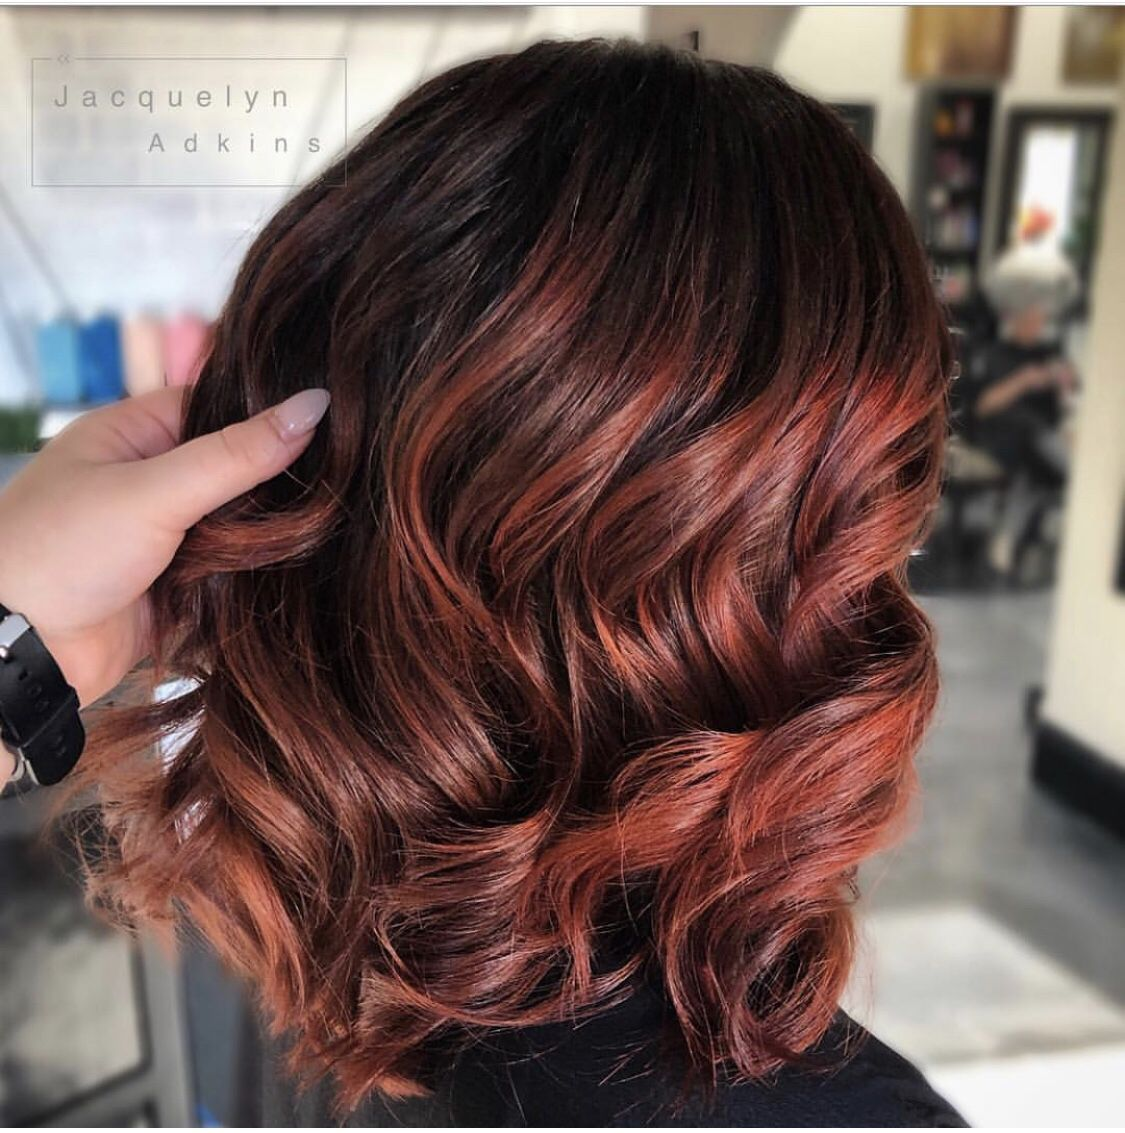 Follow Me On Instagram Unevneib Red Hair Short Red Hair Wavy Hair Curly Hair Wand Curls Hand Painted Hair Bala Curly Hair With Wand Maroon Hair Short Red Hair